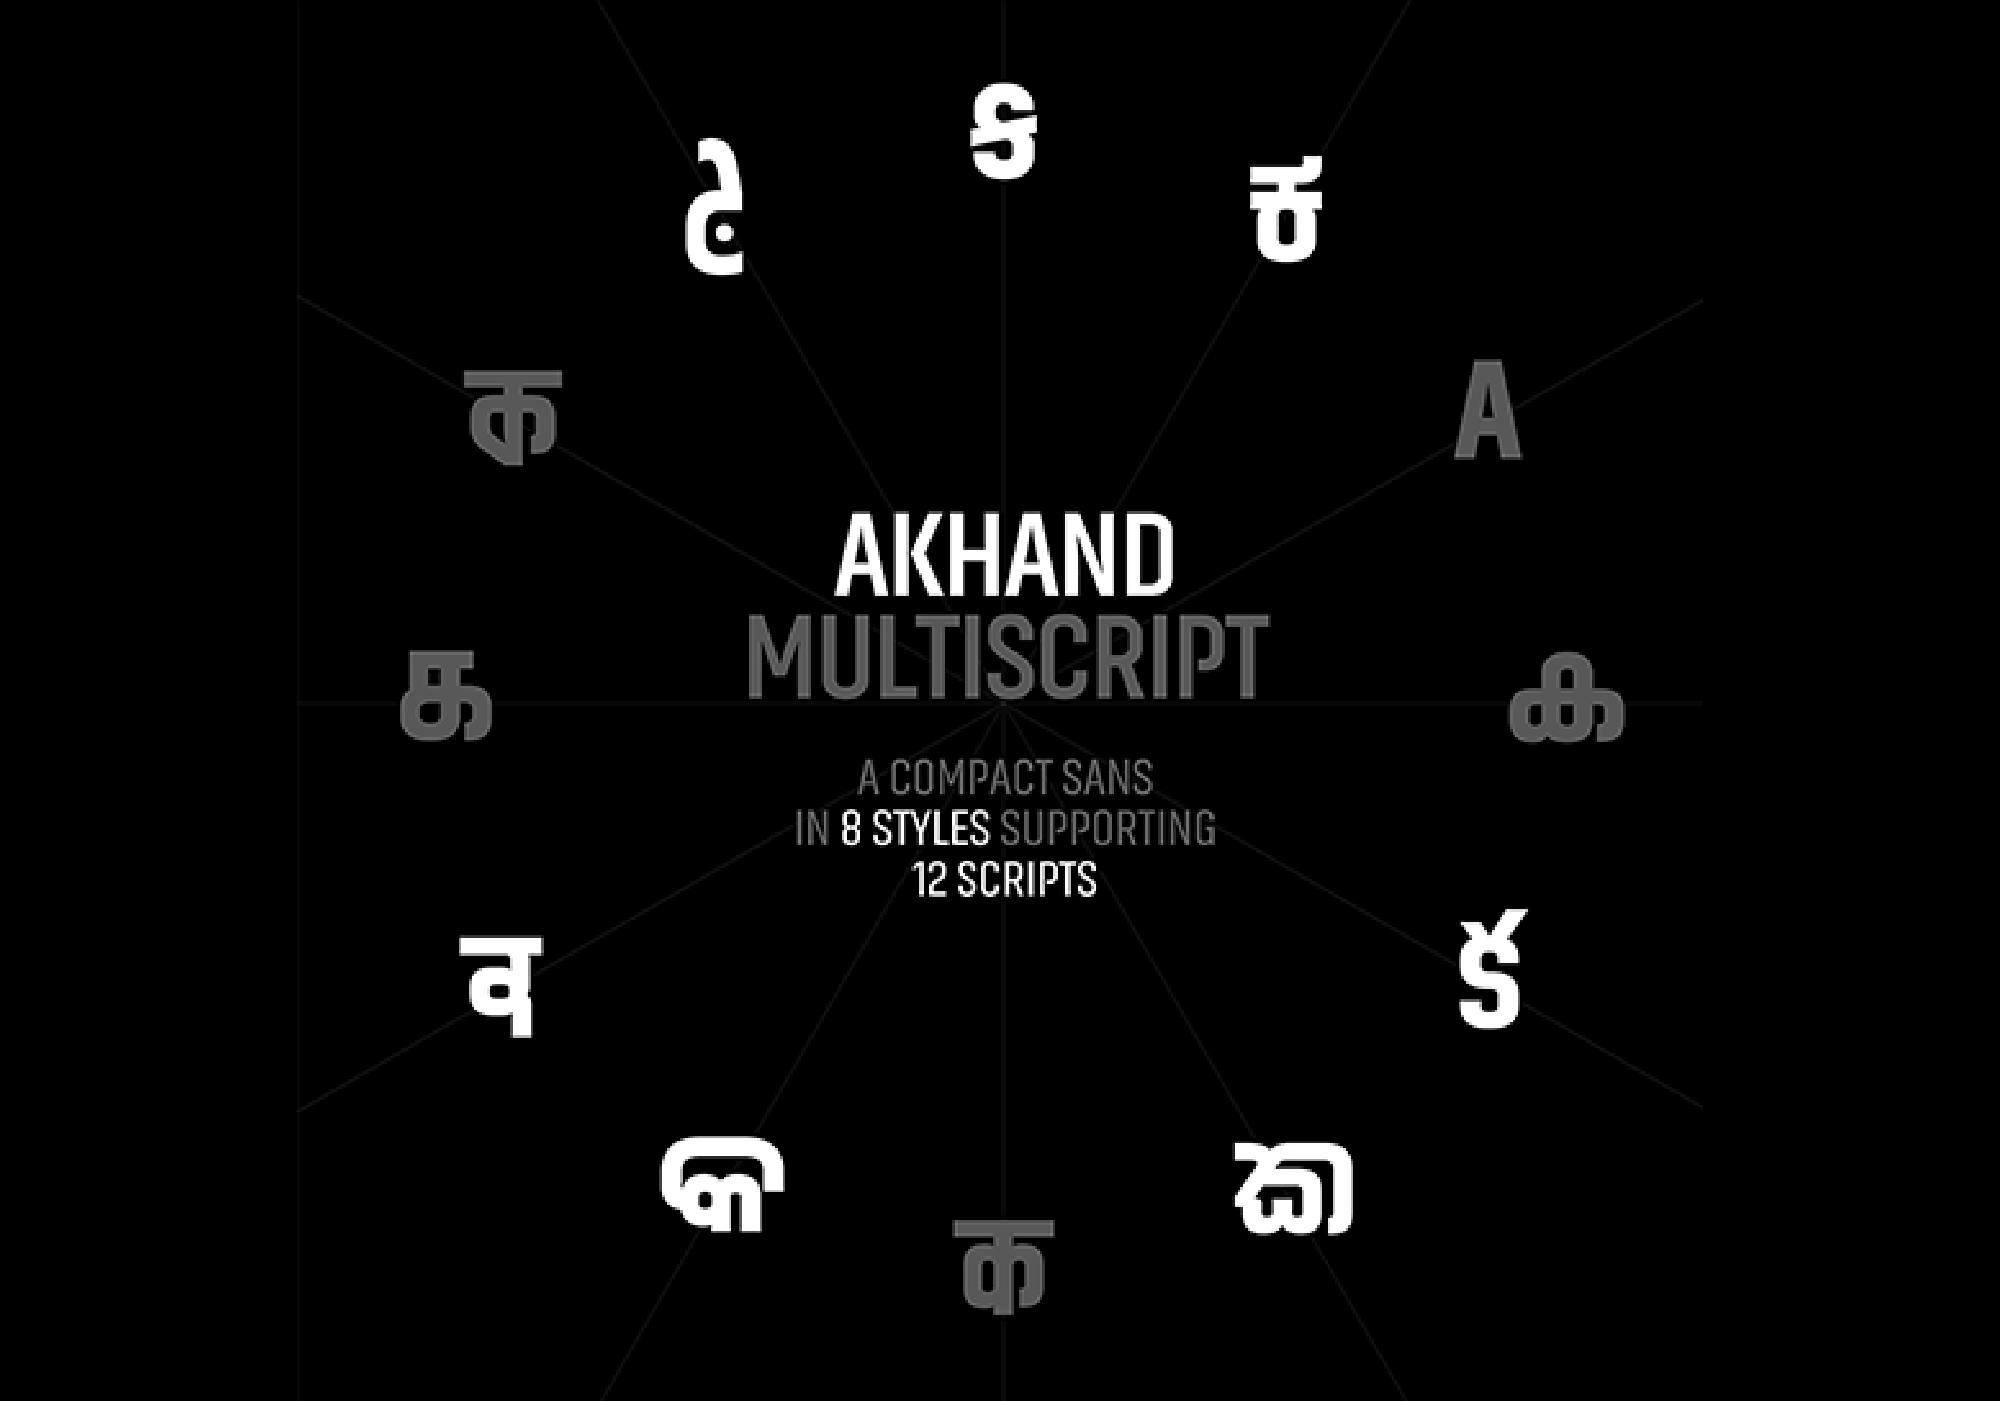 Akhand Multiscript companion